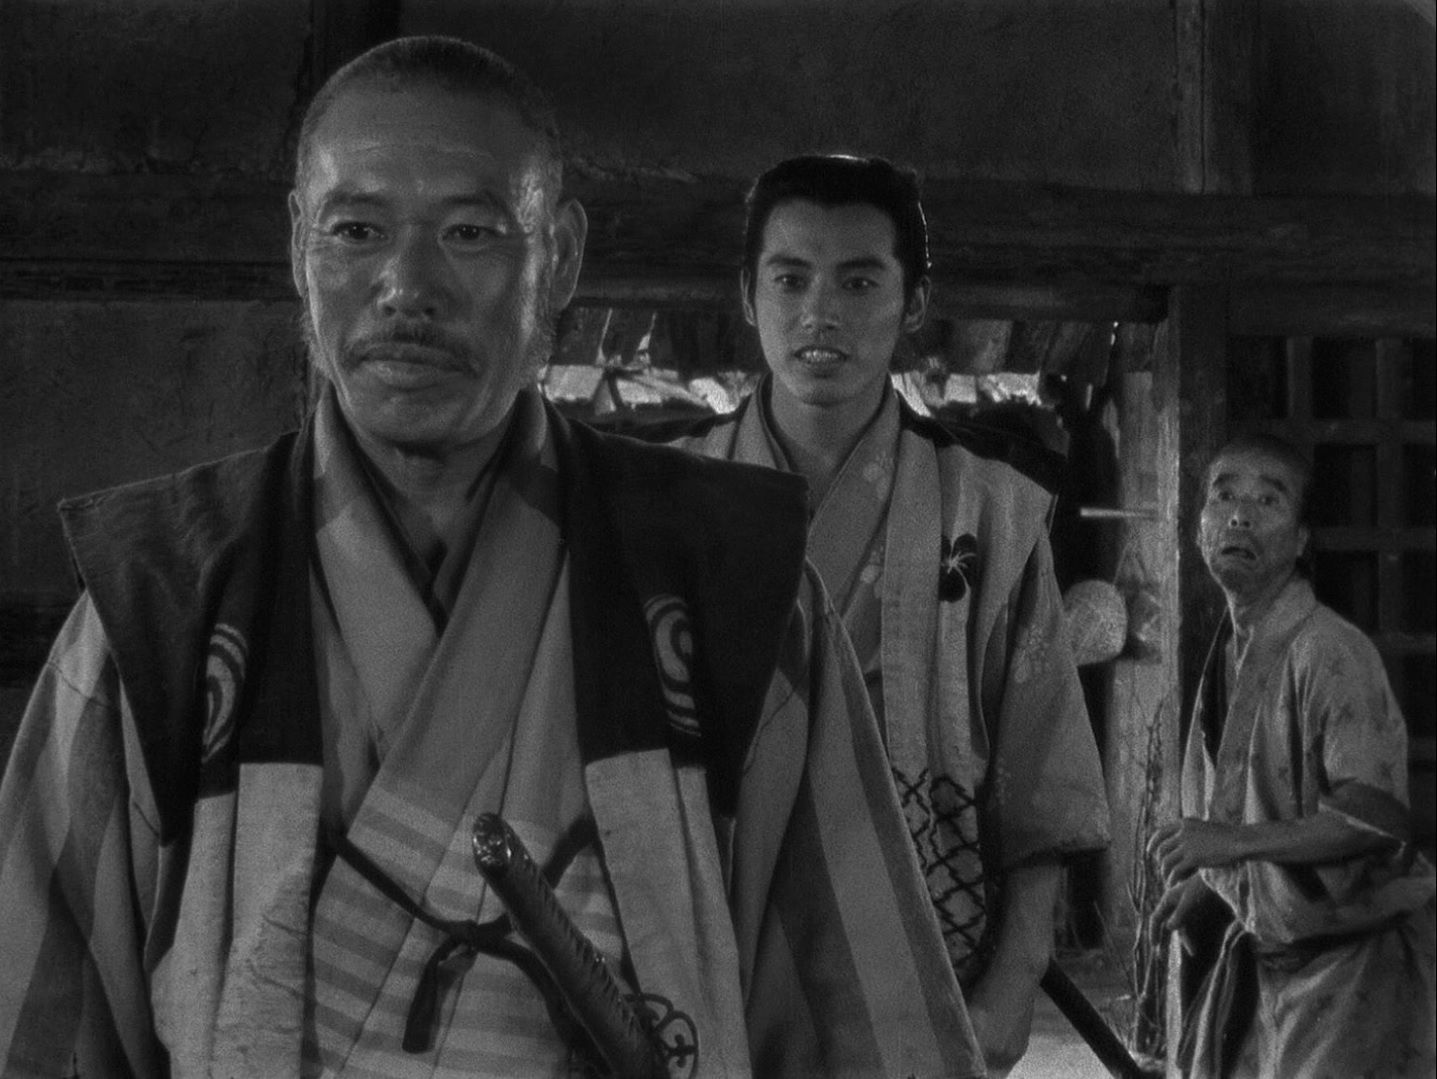 Les septs samouraïs